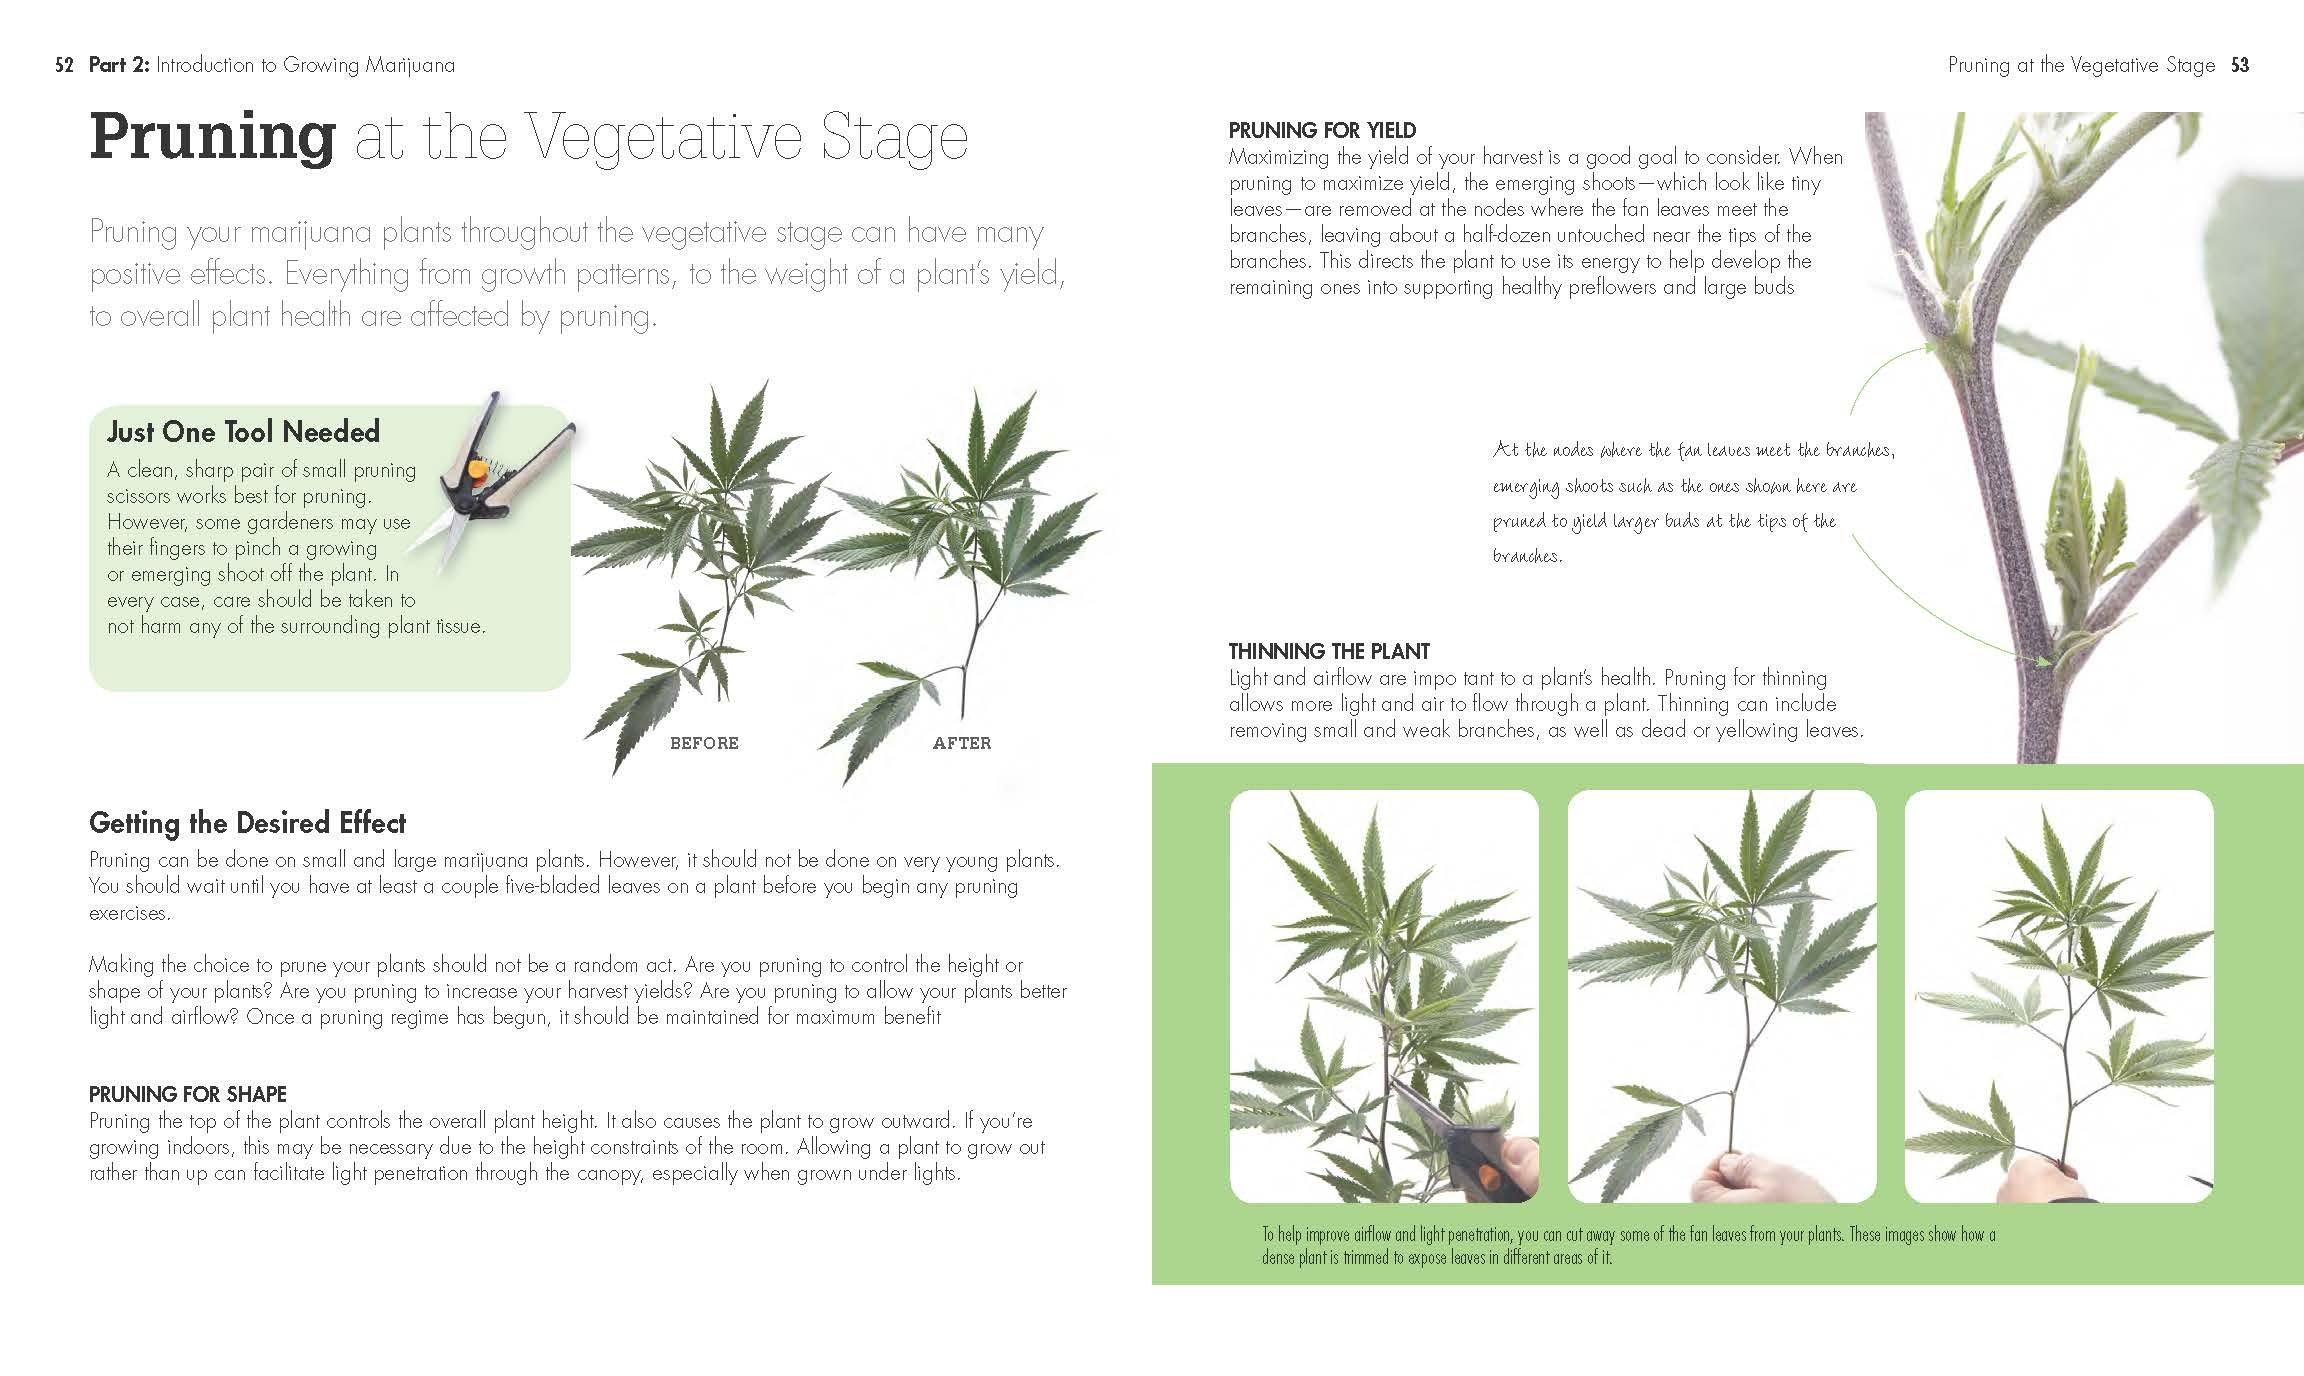 Amazon growing marijuana idiots guides 9781615648948 amazon growing marijuana idiots guides 9781615648948 kevin oliver chadd mckeen books nvjuhfo Image collections